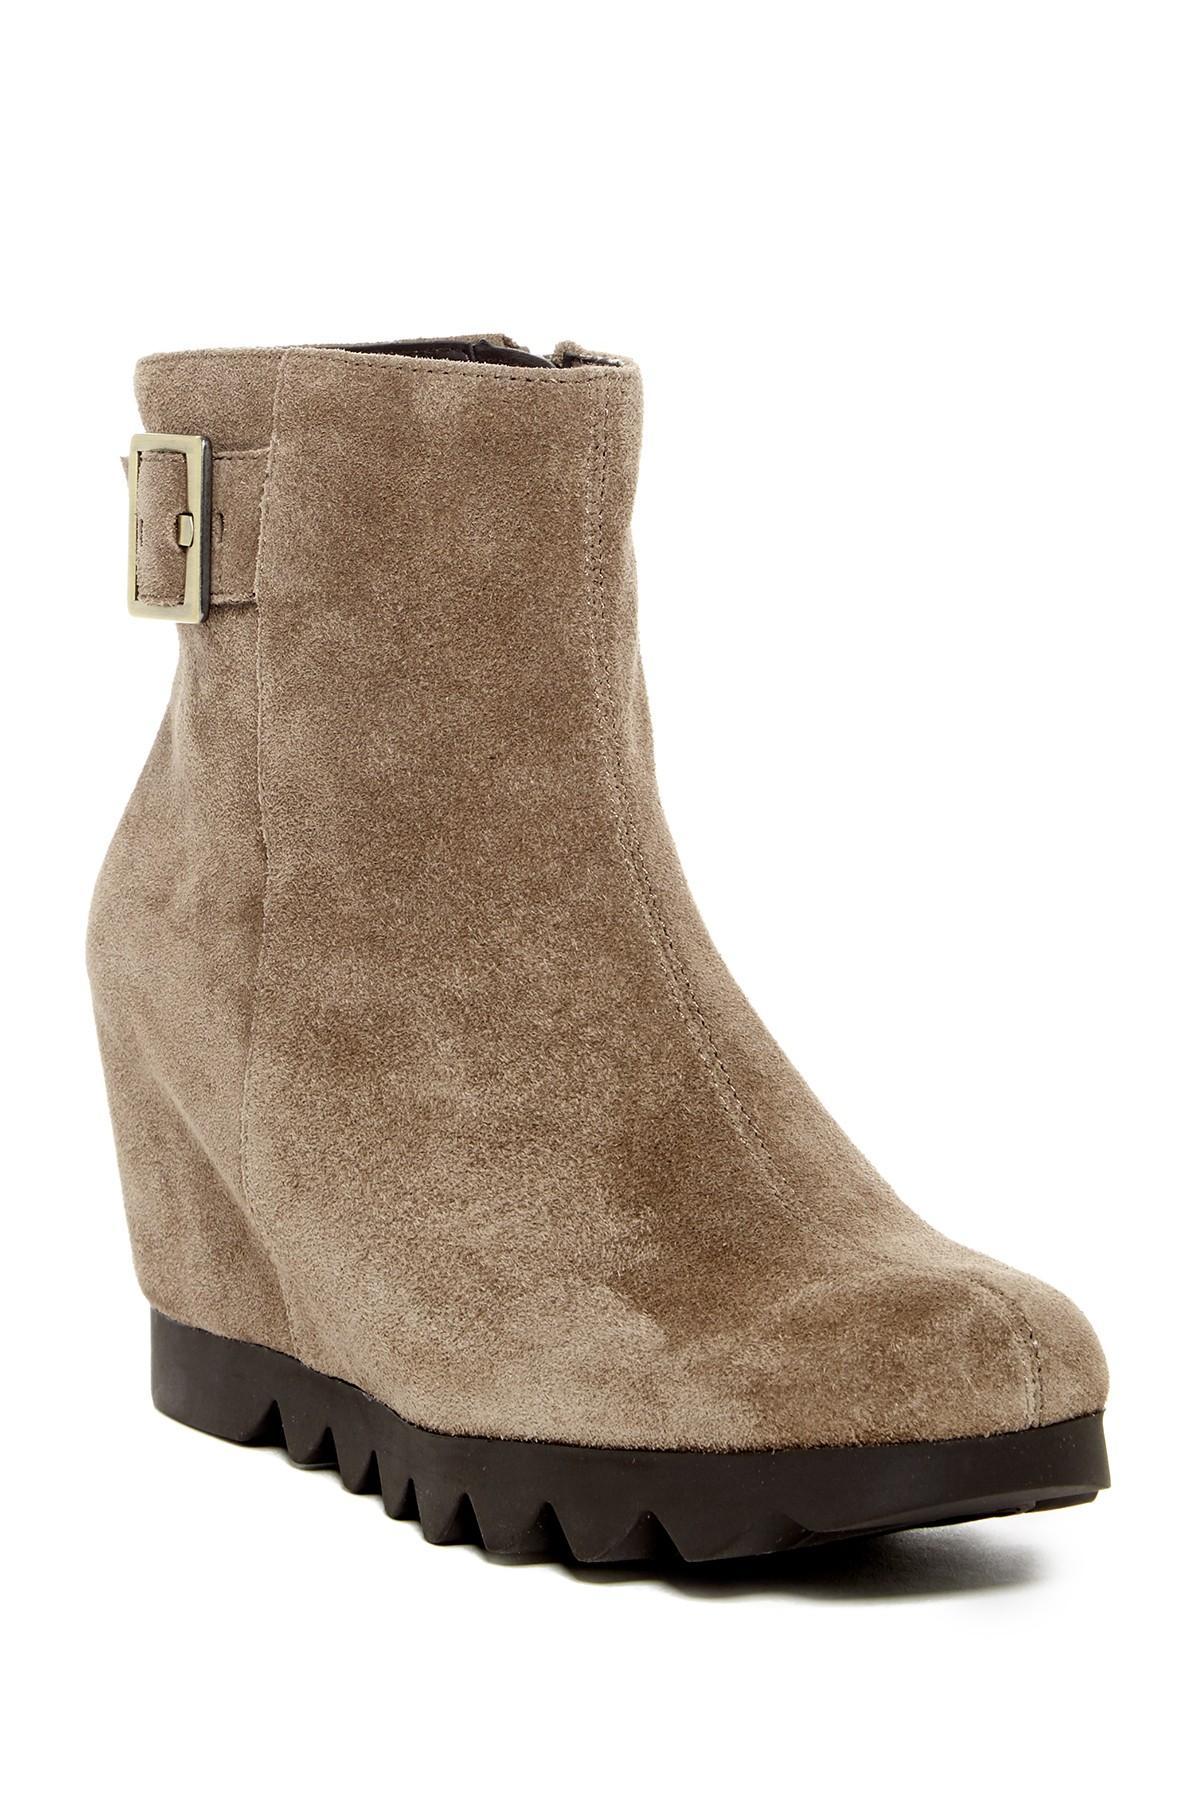 aerosoles confidential wedge boot in brown lyst